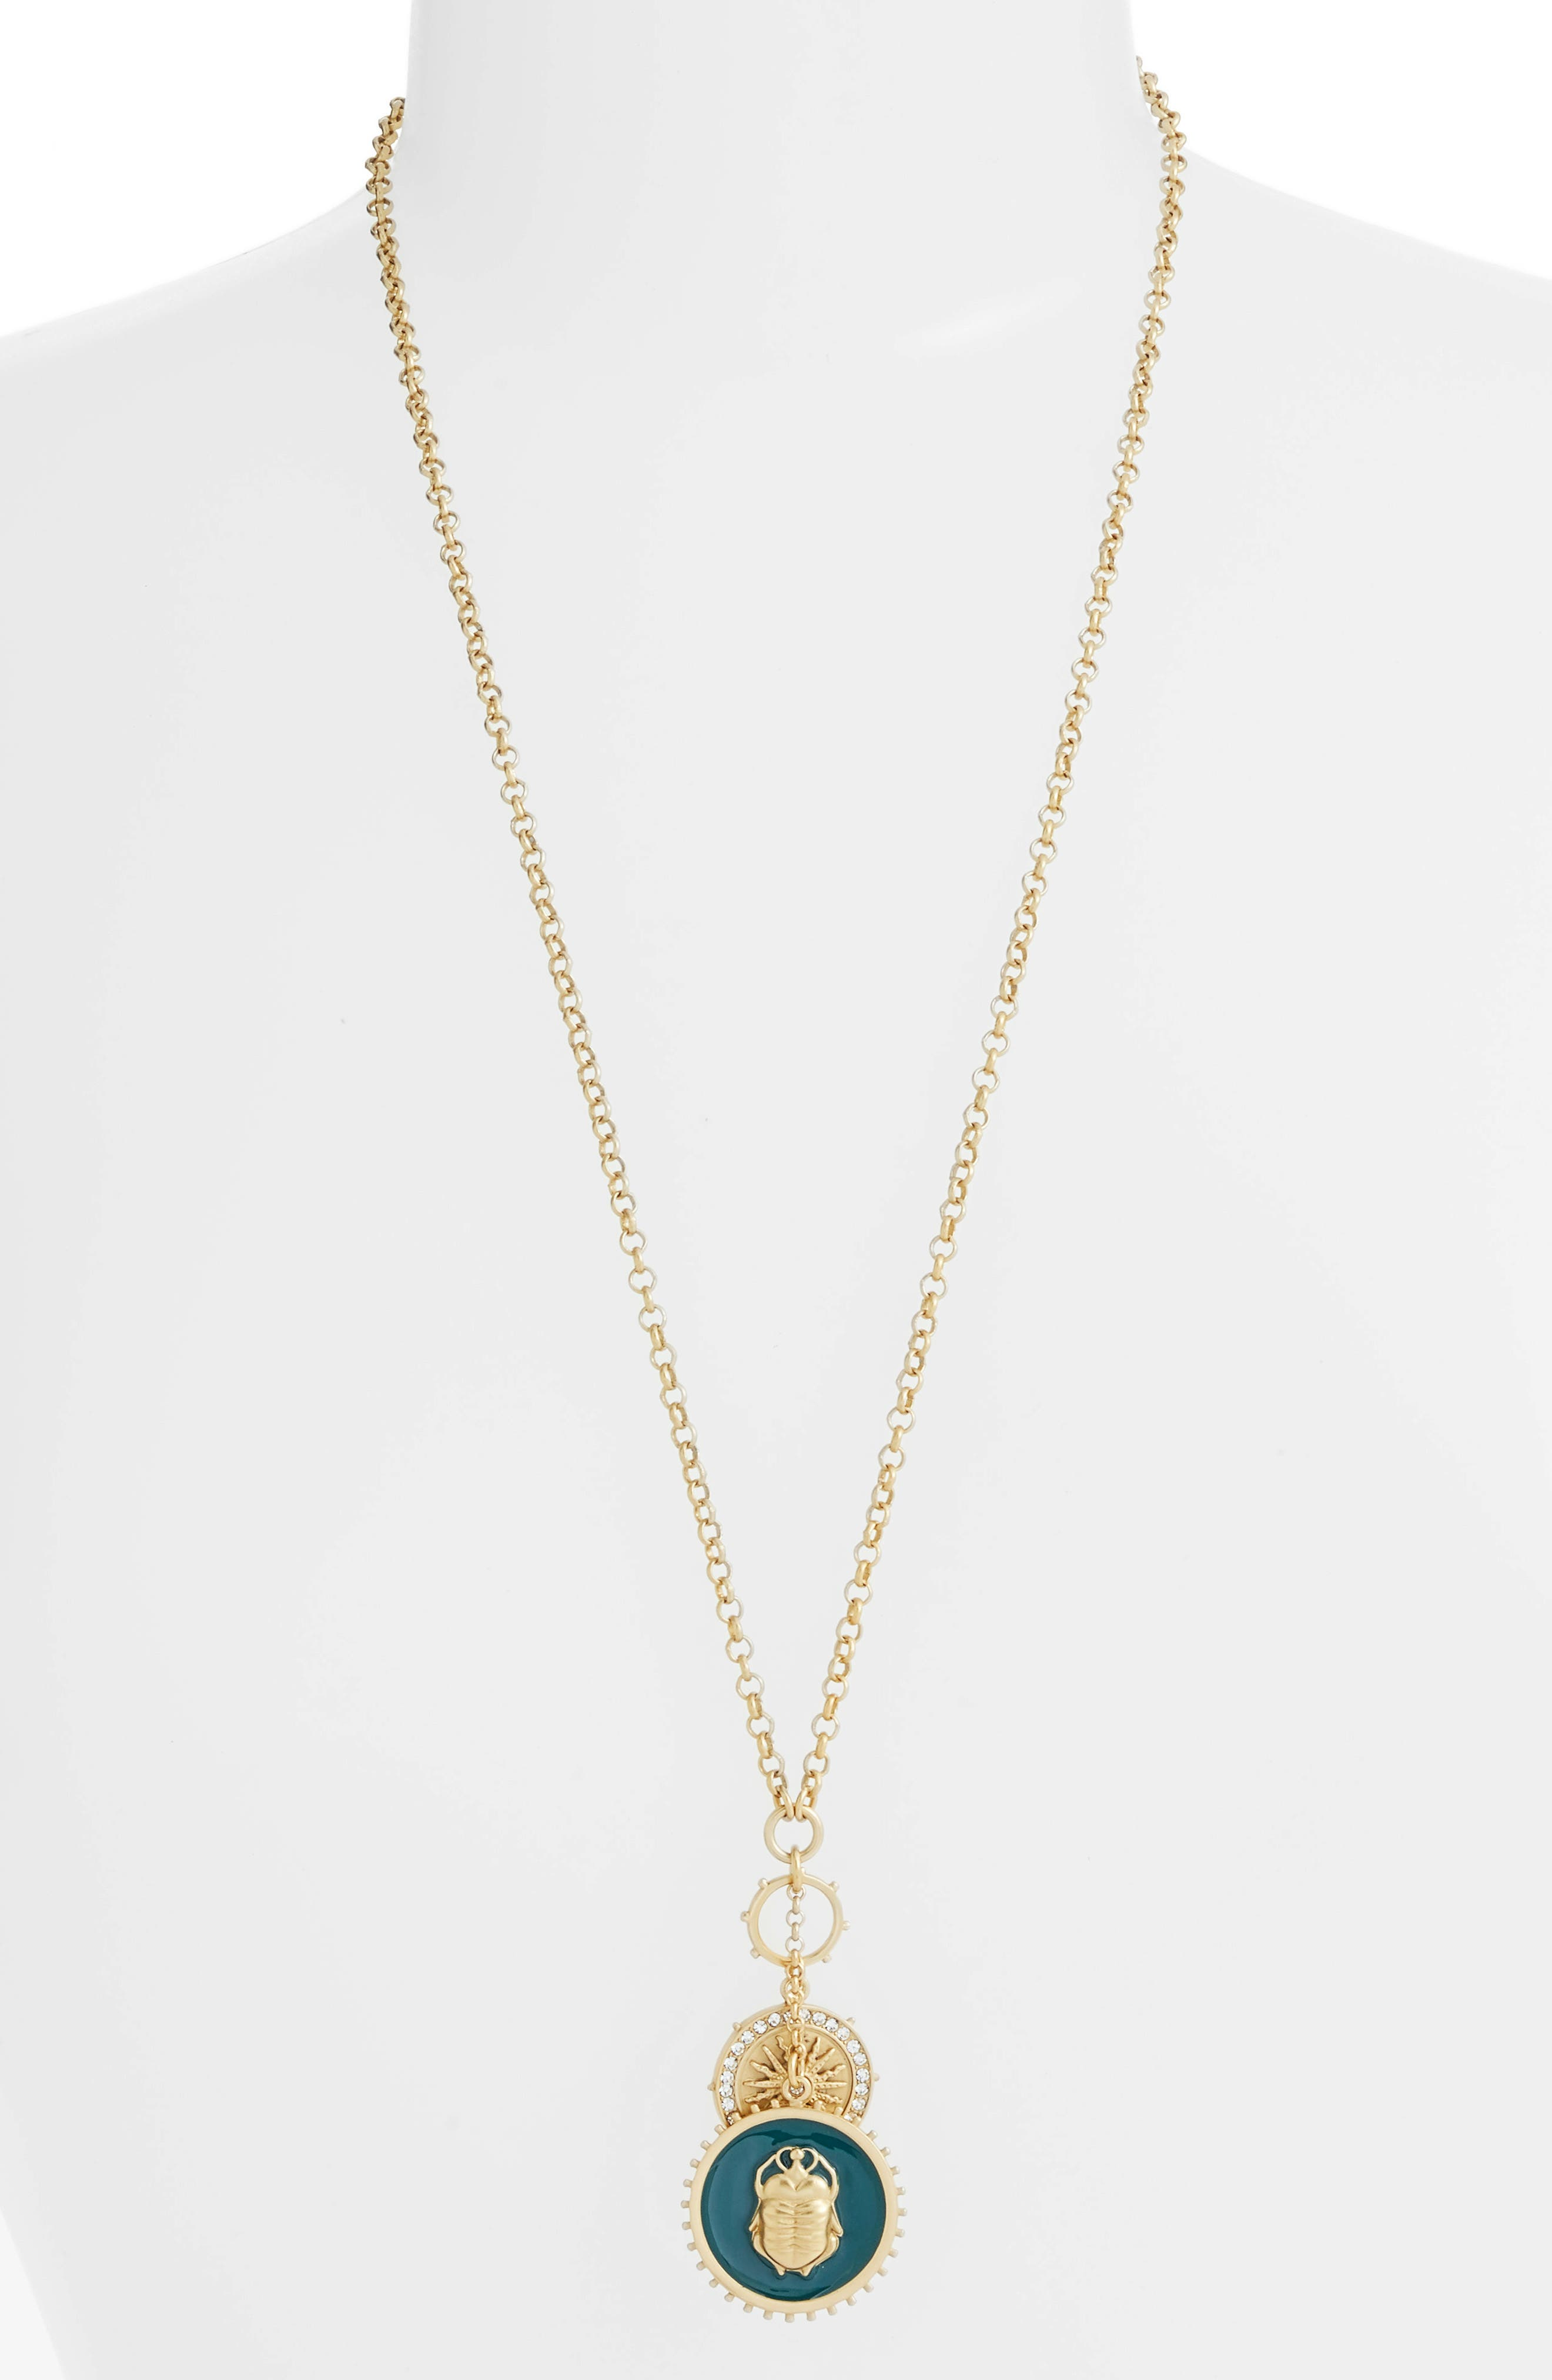 Enamel Scarab Pendant Necklace,                             Main thumbnail 1, color,                             710